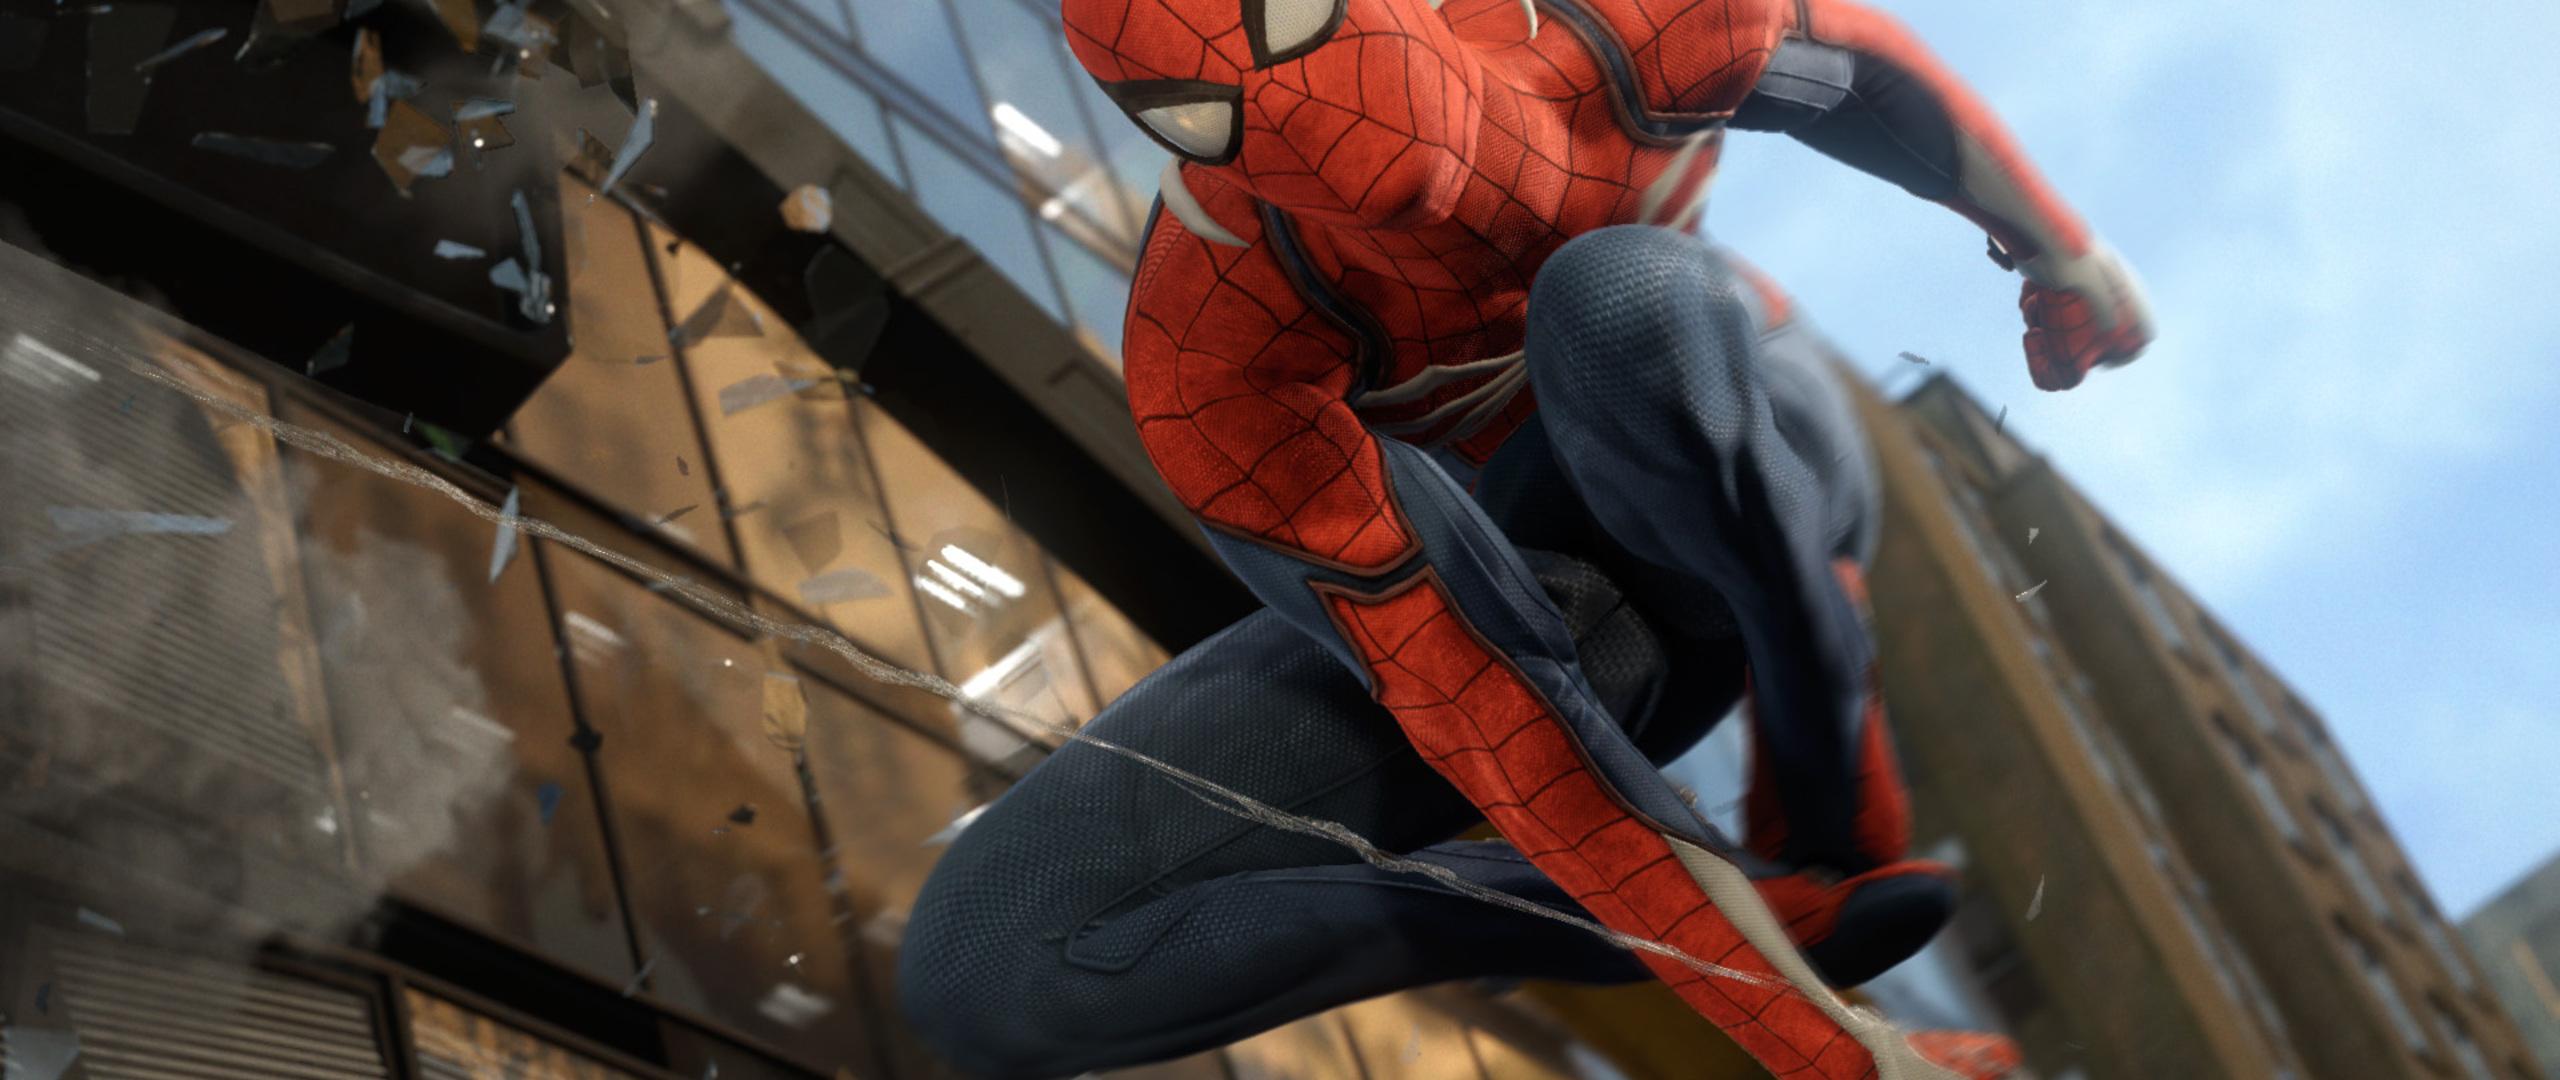 Comics Spiderman HD Wallpapers, Desktop Backgrounds, Mobile ...